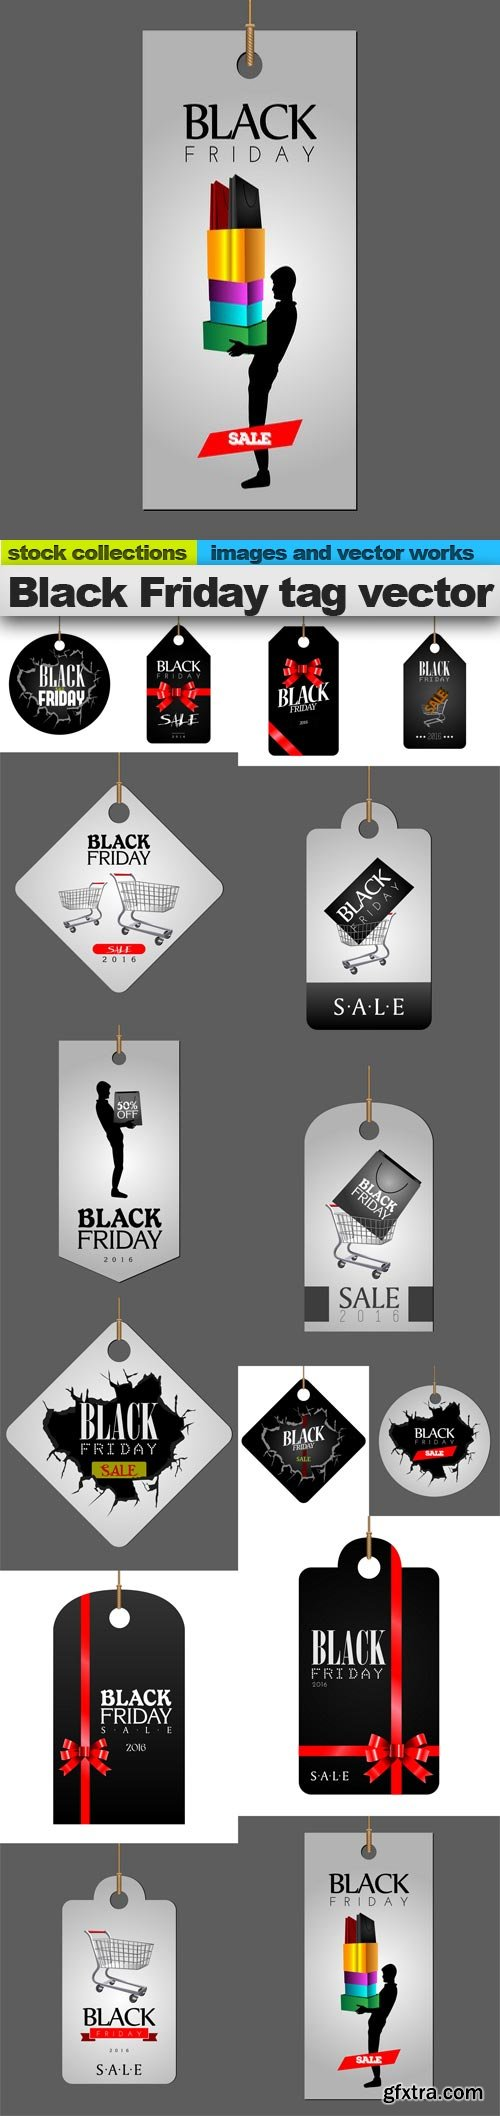 Black Friday tag vector, 15 x EPS